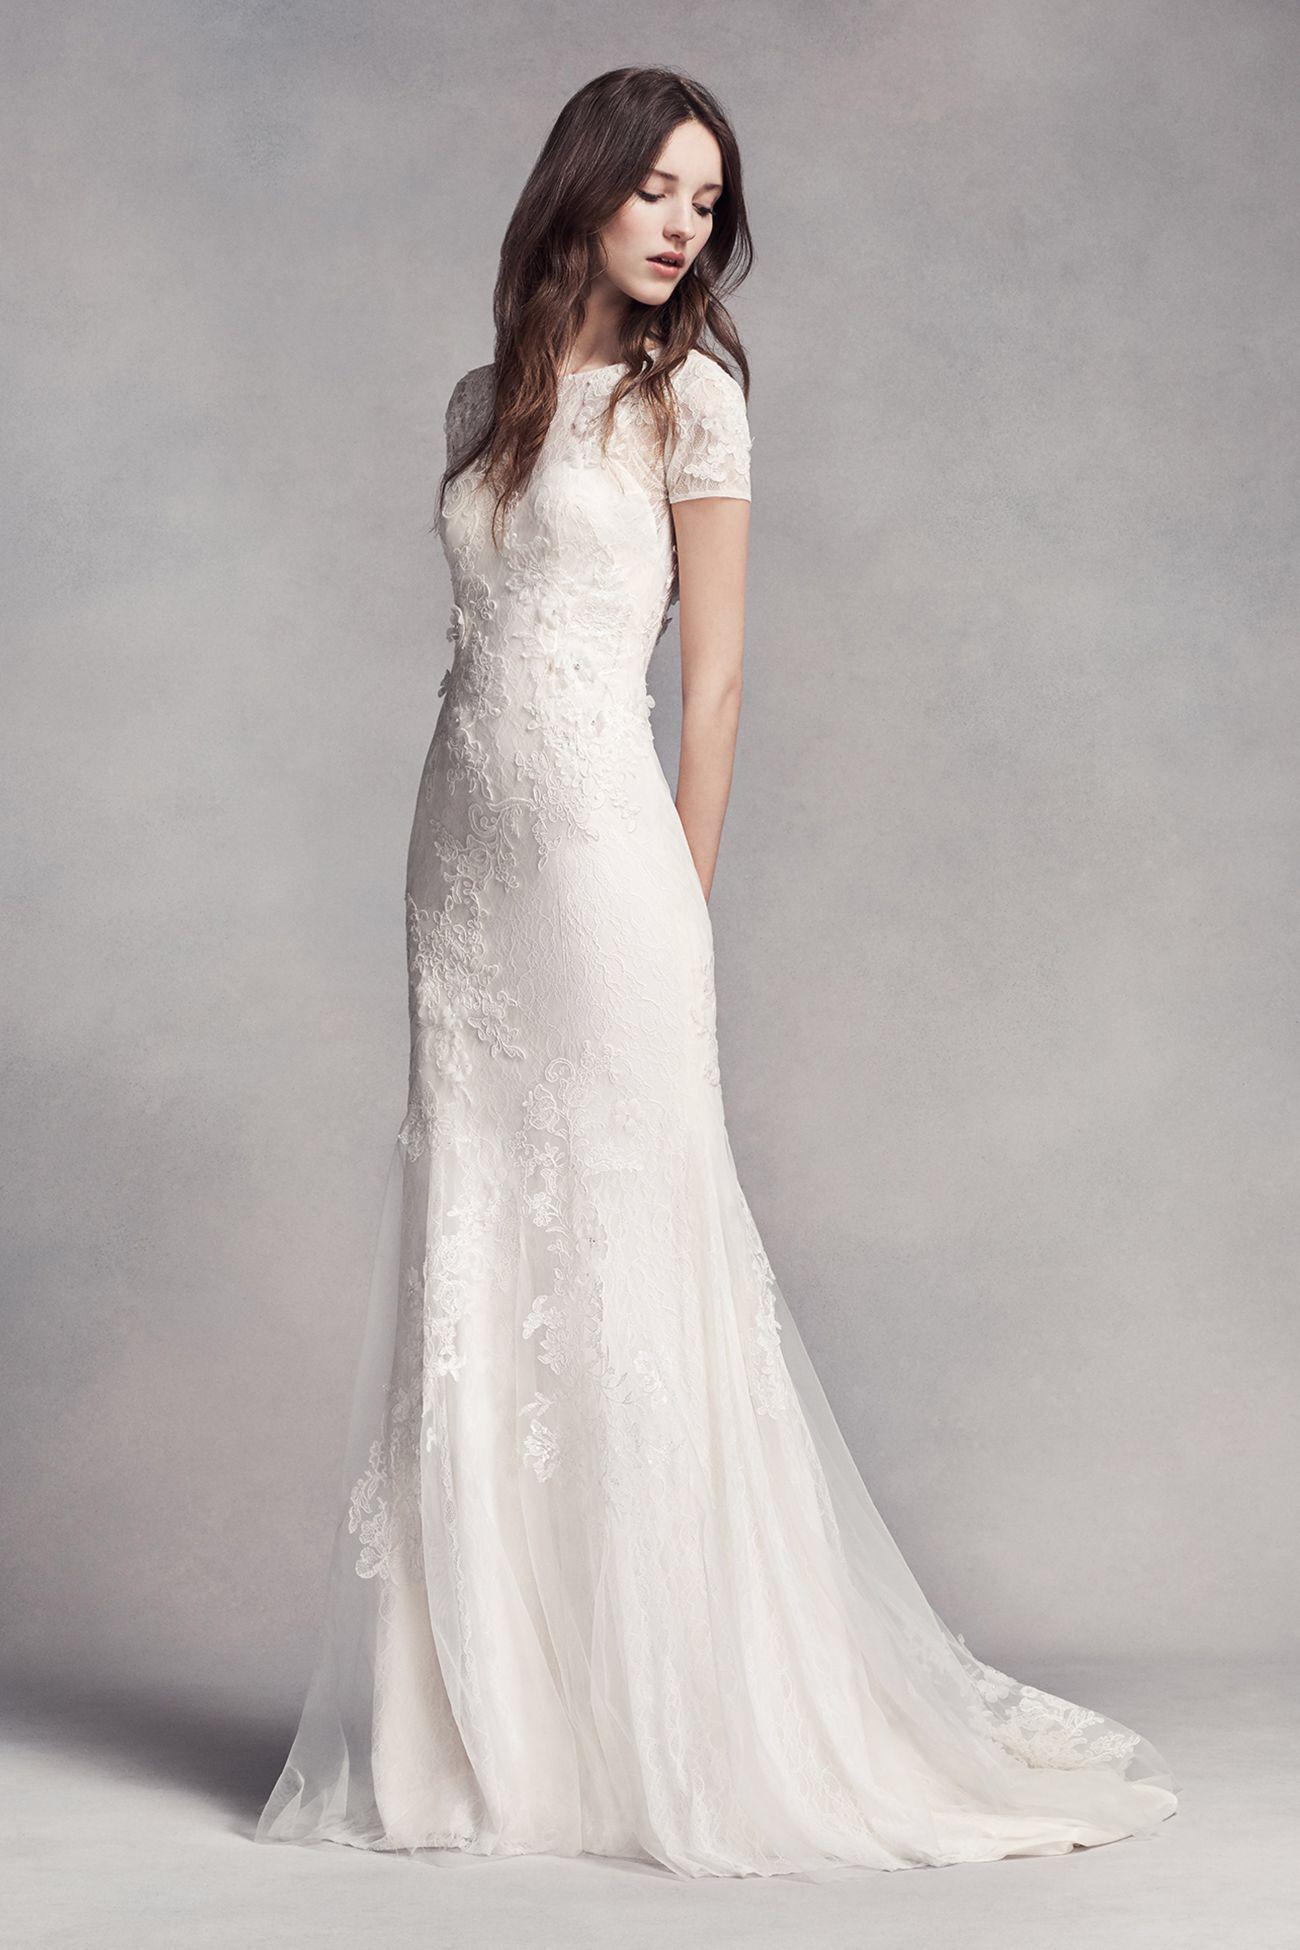 My New Favorite! www.davidsbridal.com/10678870 | Wedding Dress Ideas ...